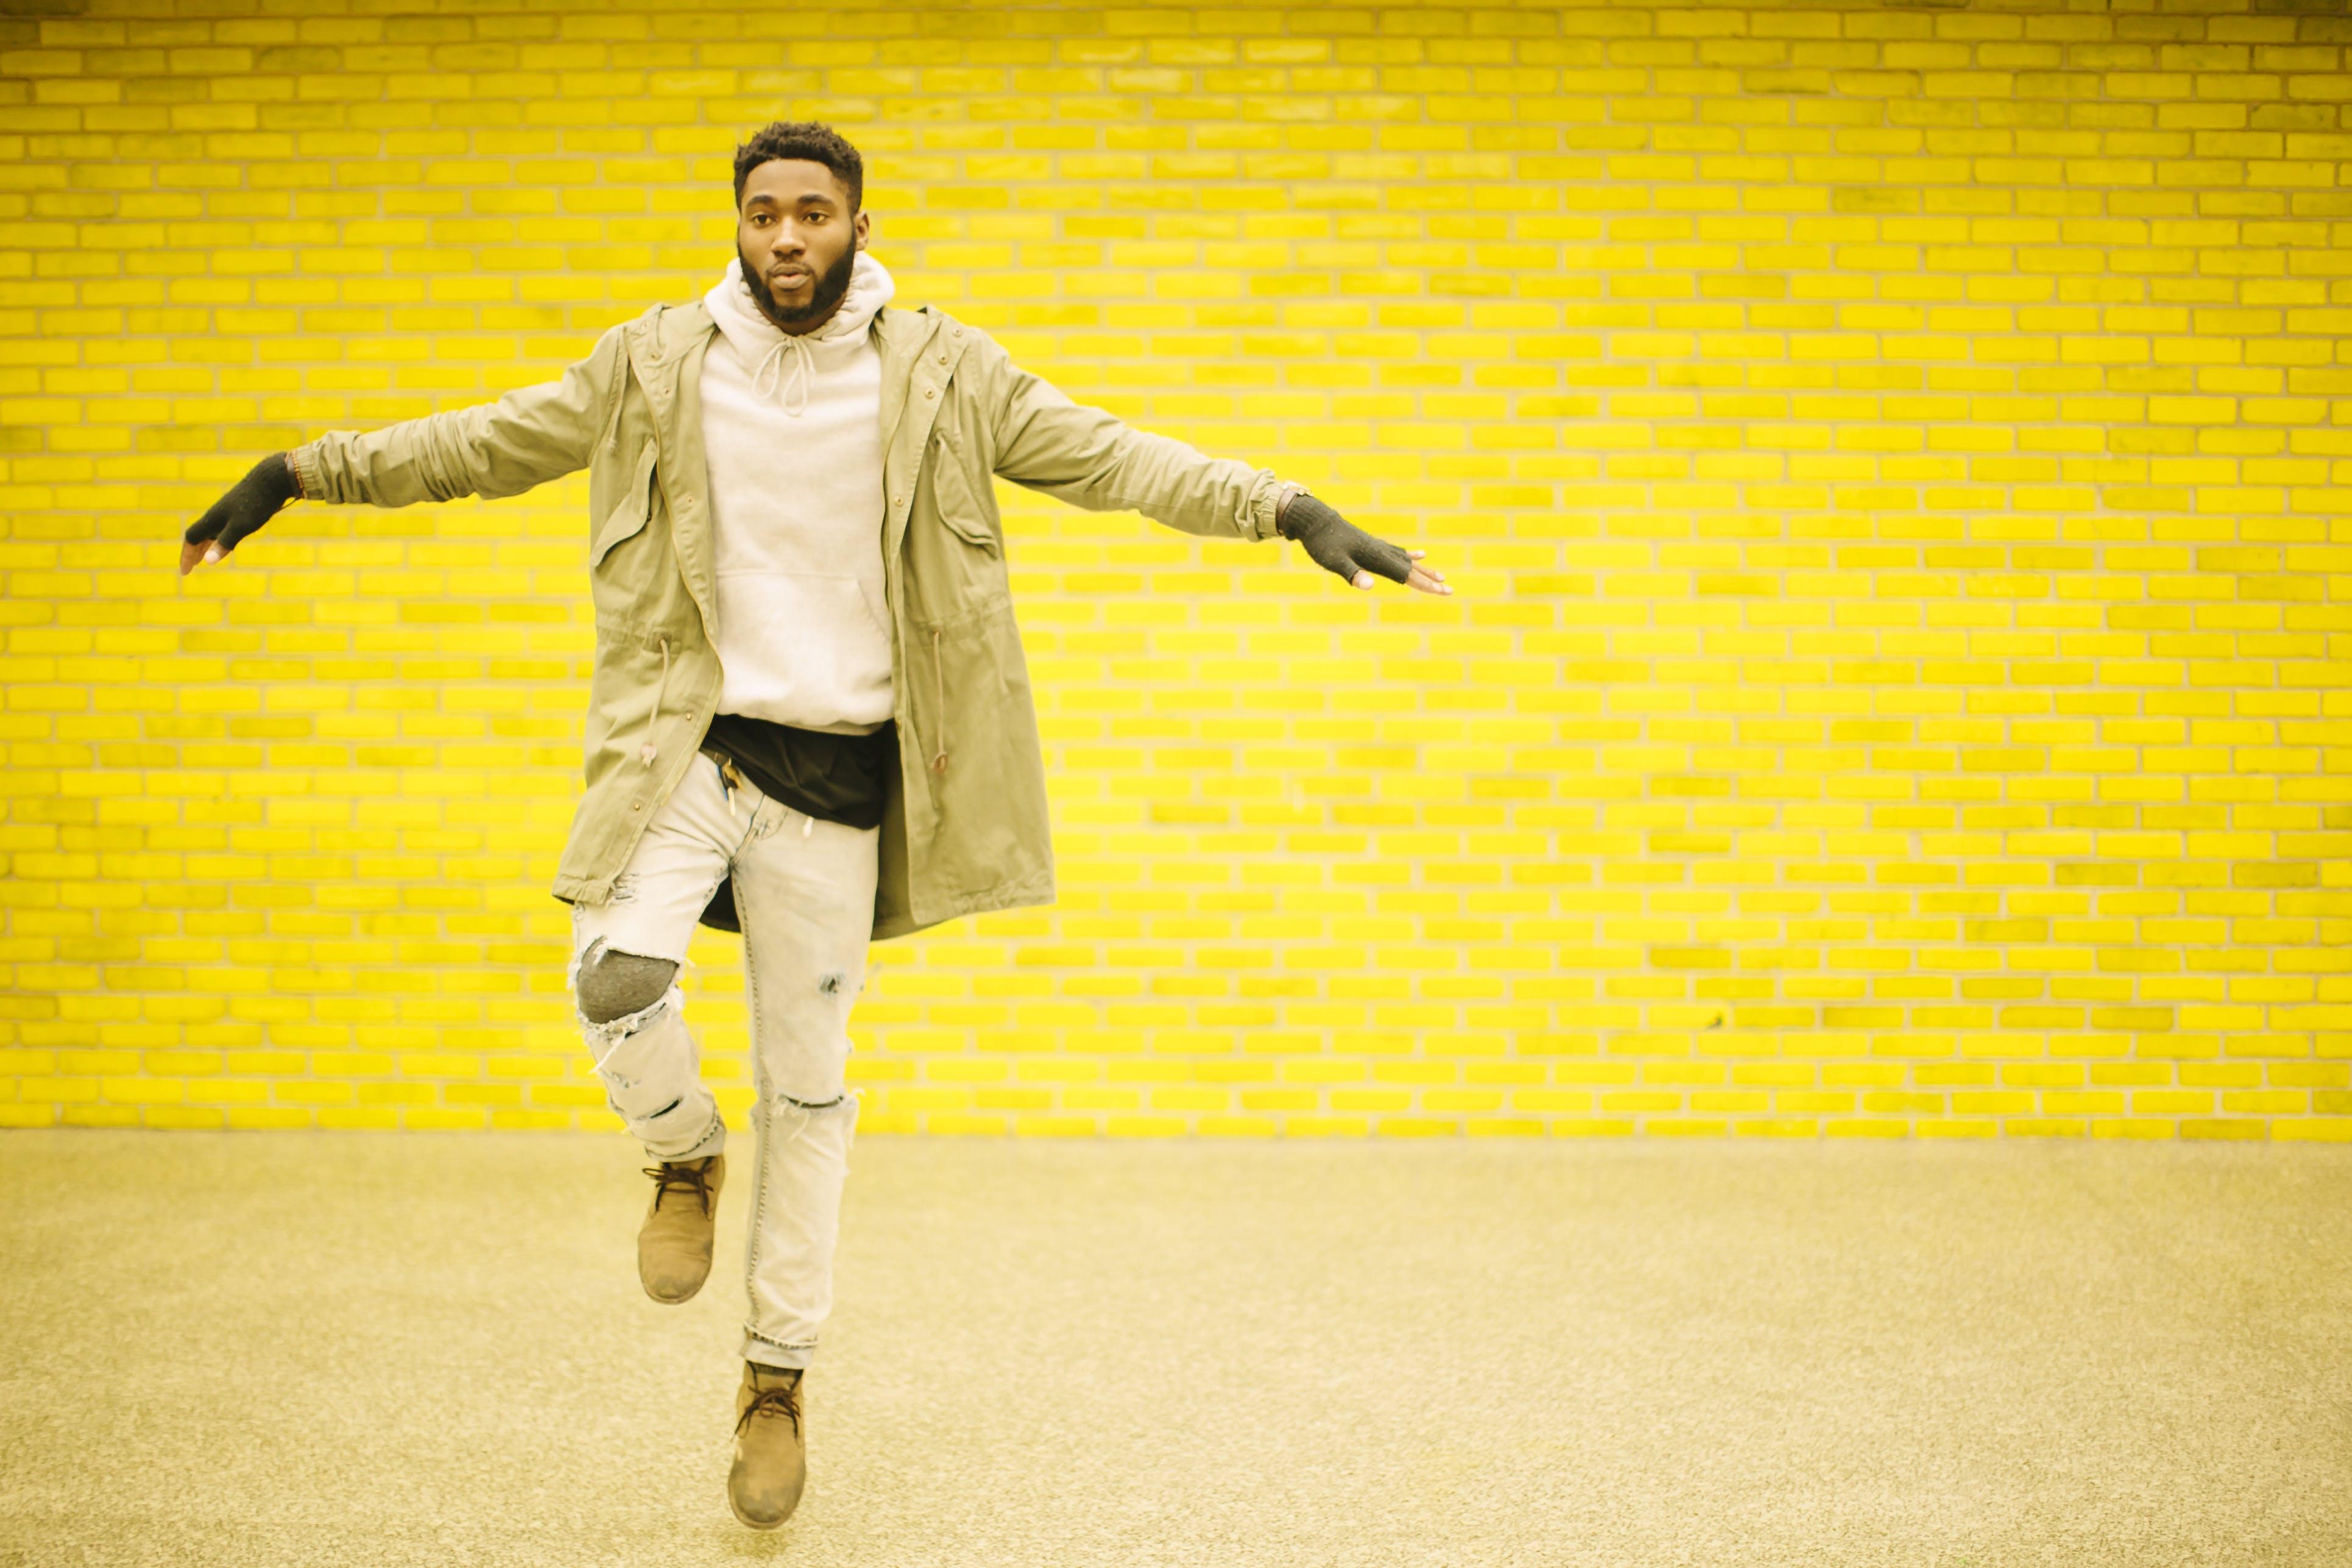 Kostenloses Stock Foto zu action, afroamerikaner, afroamerikanischer mann, aktiv